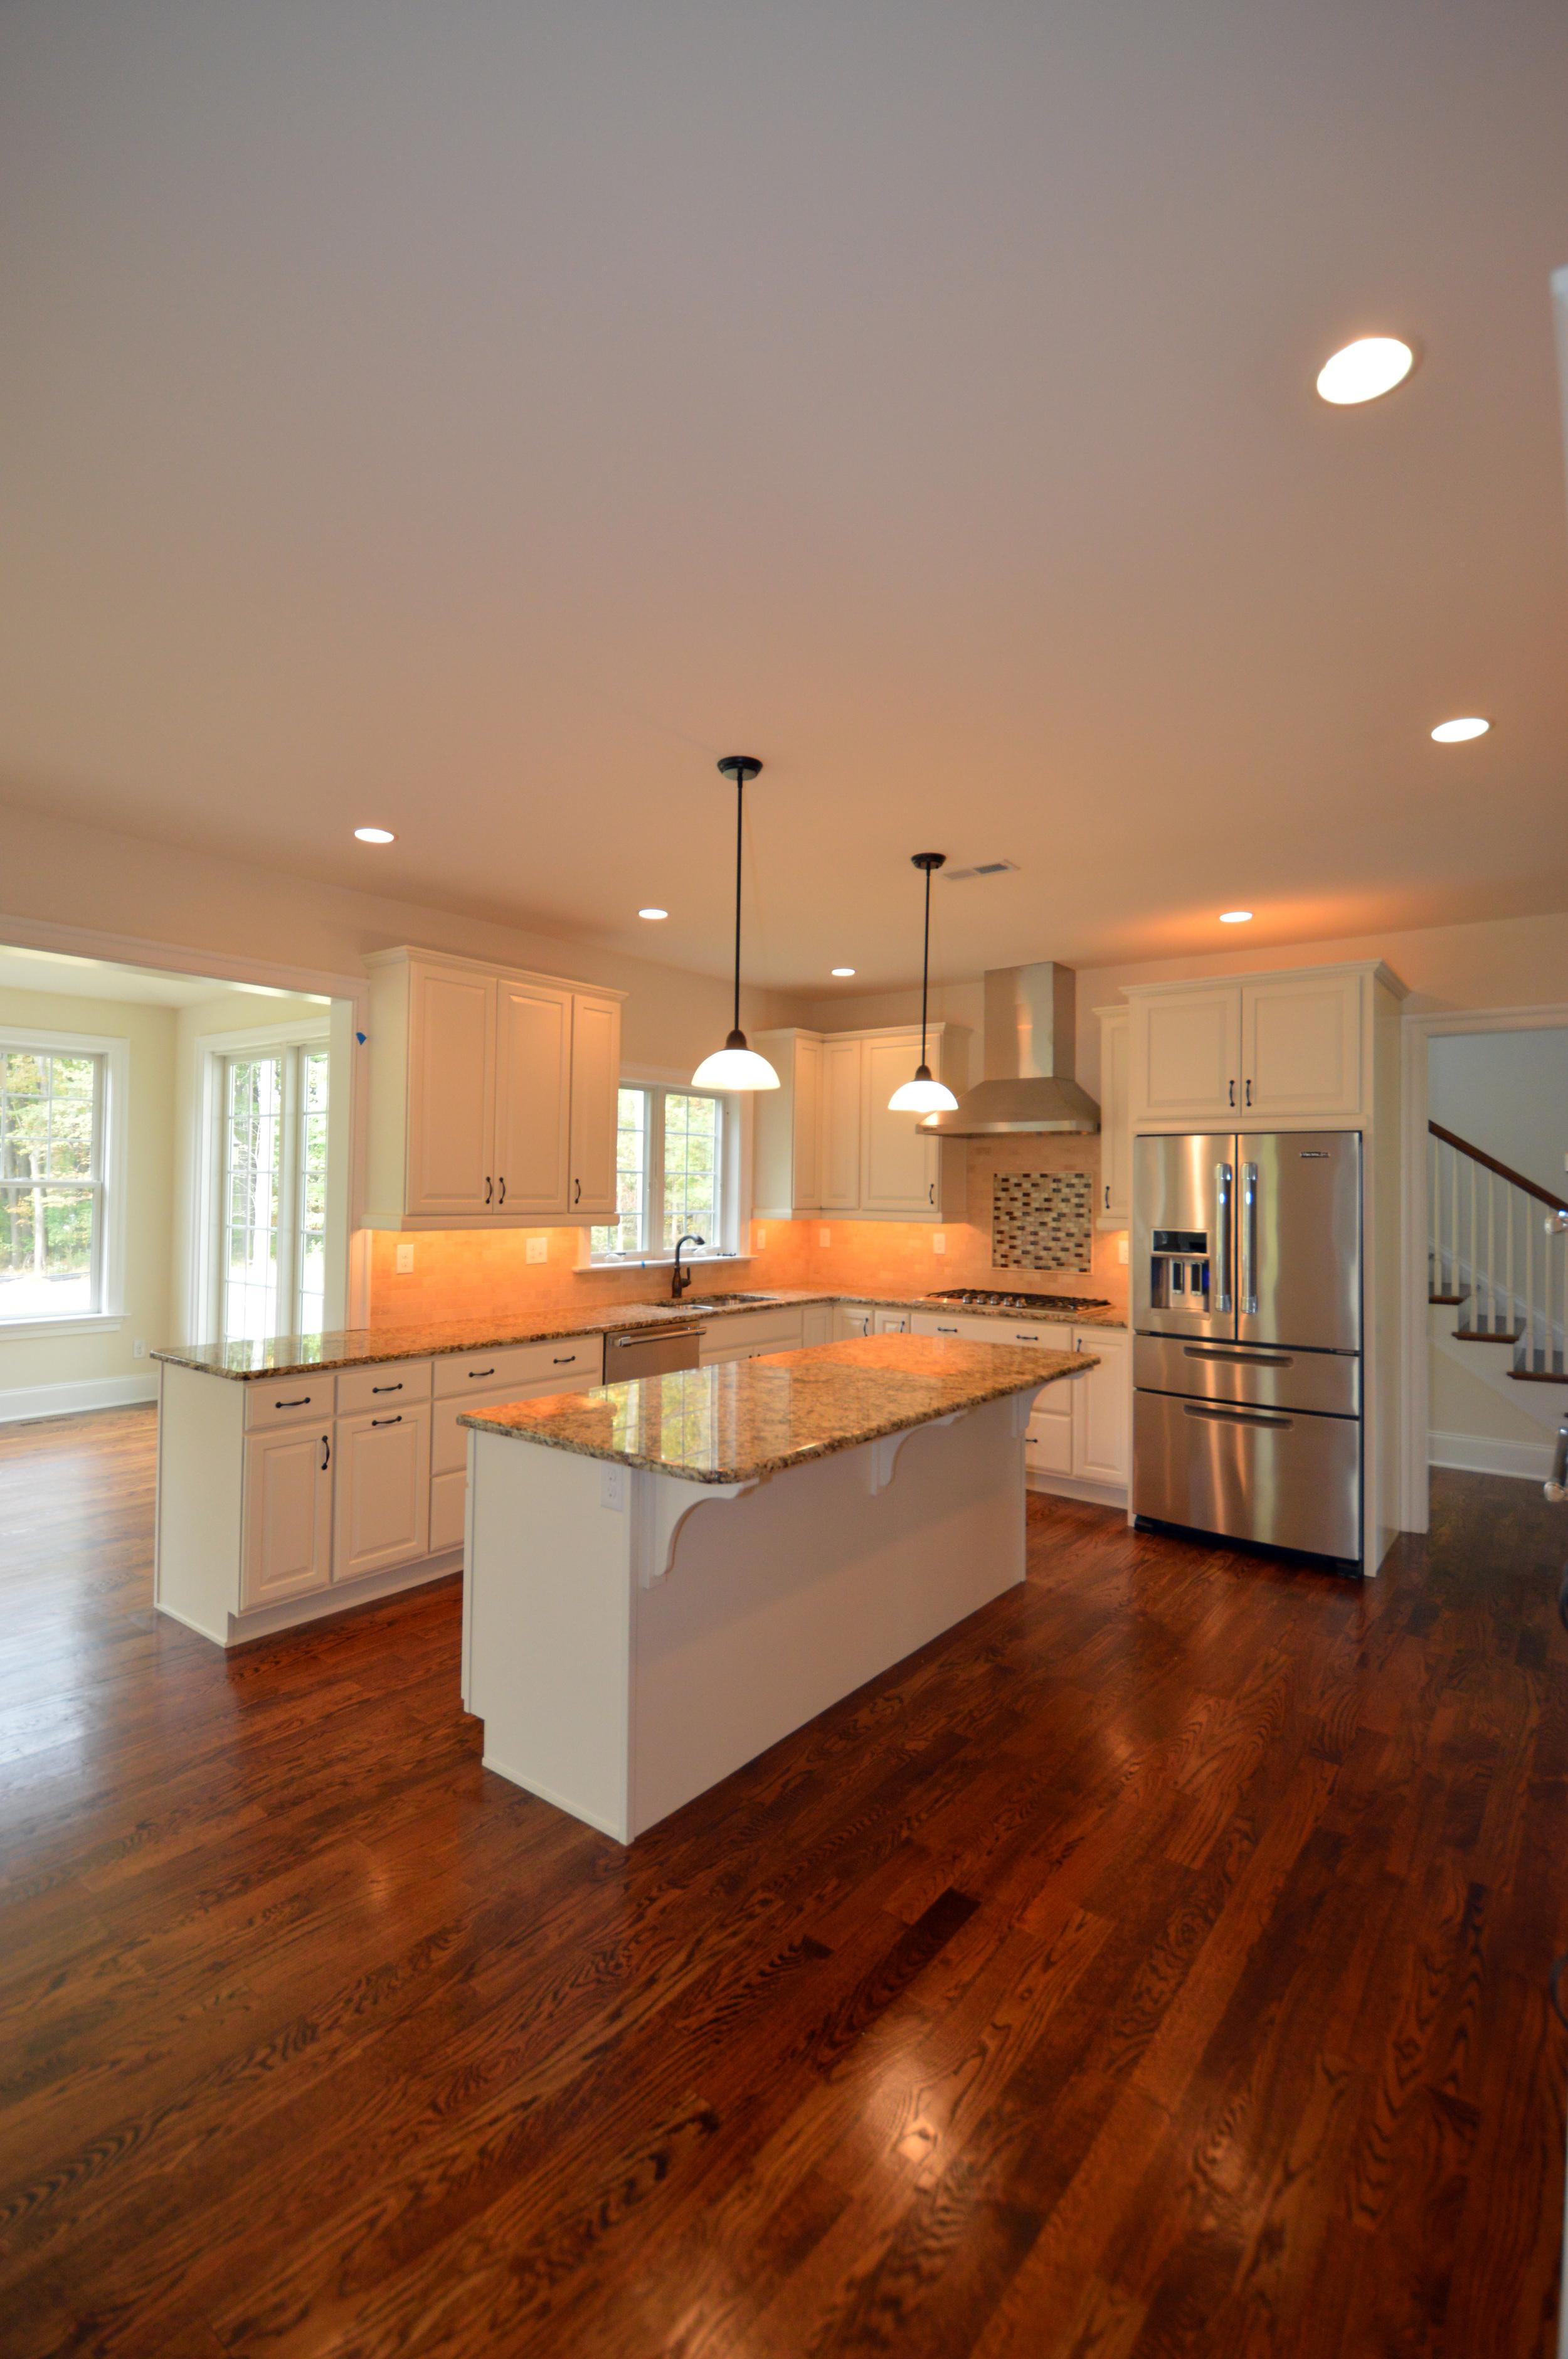 New construction custom home kitchen in Malvern, PA